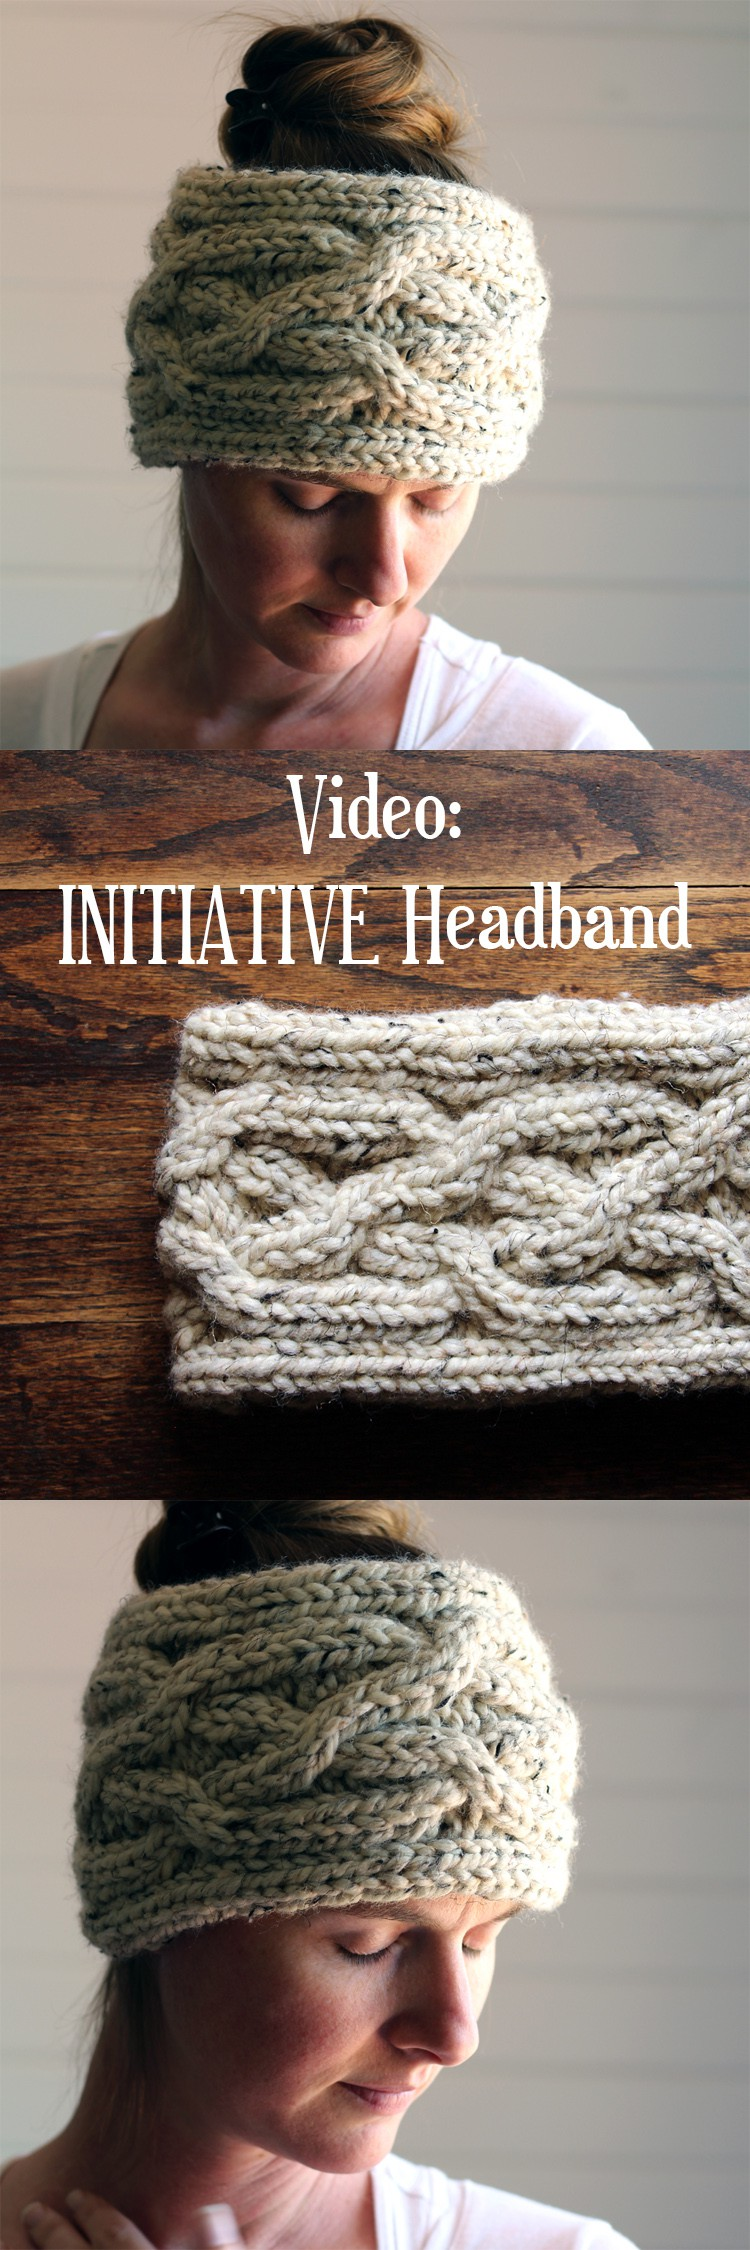 Video: Initiative Headband Knitting Pattern